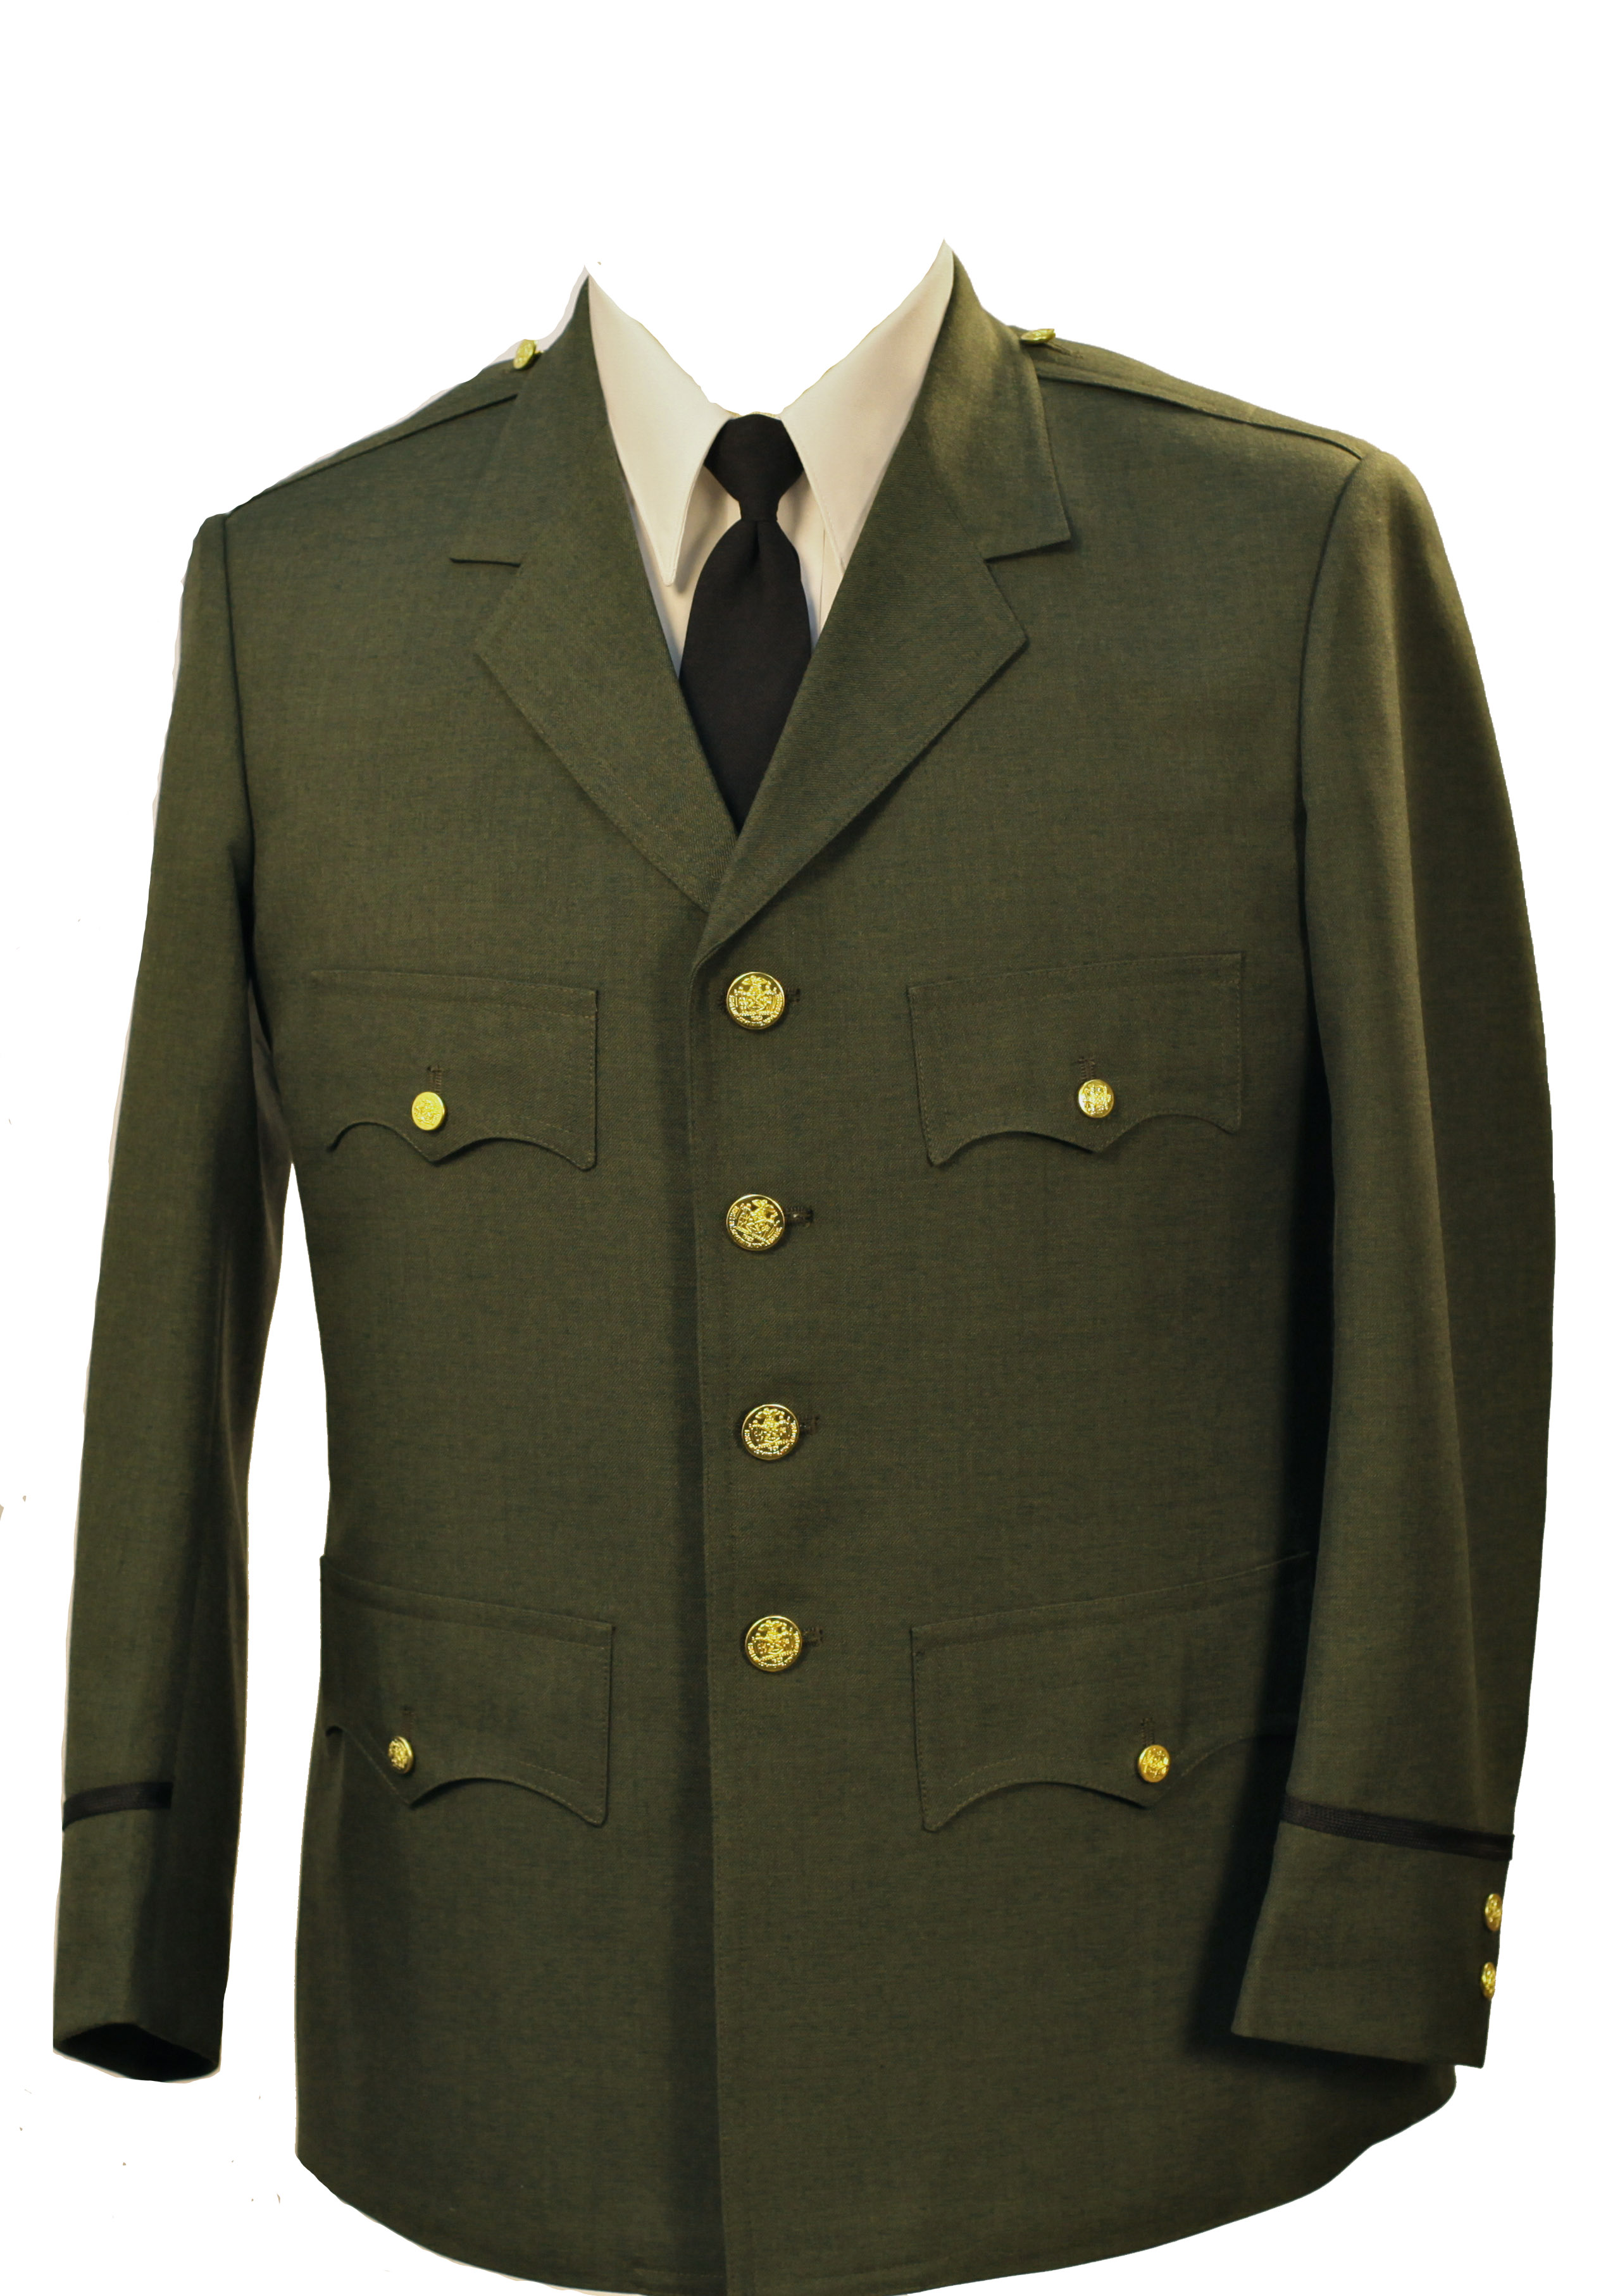 Security Dress Uniform